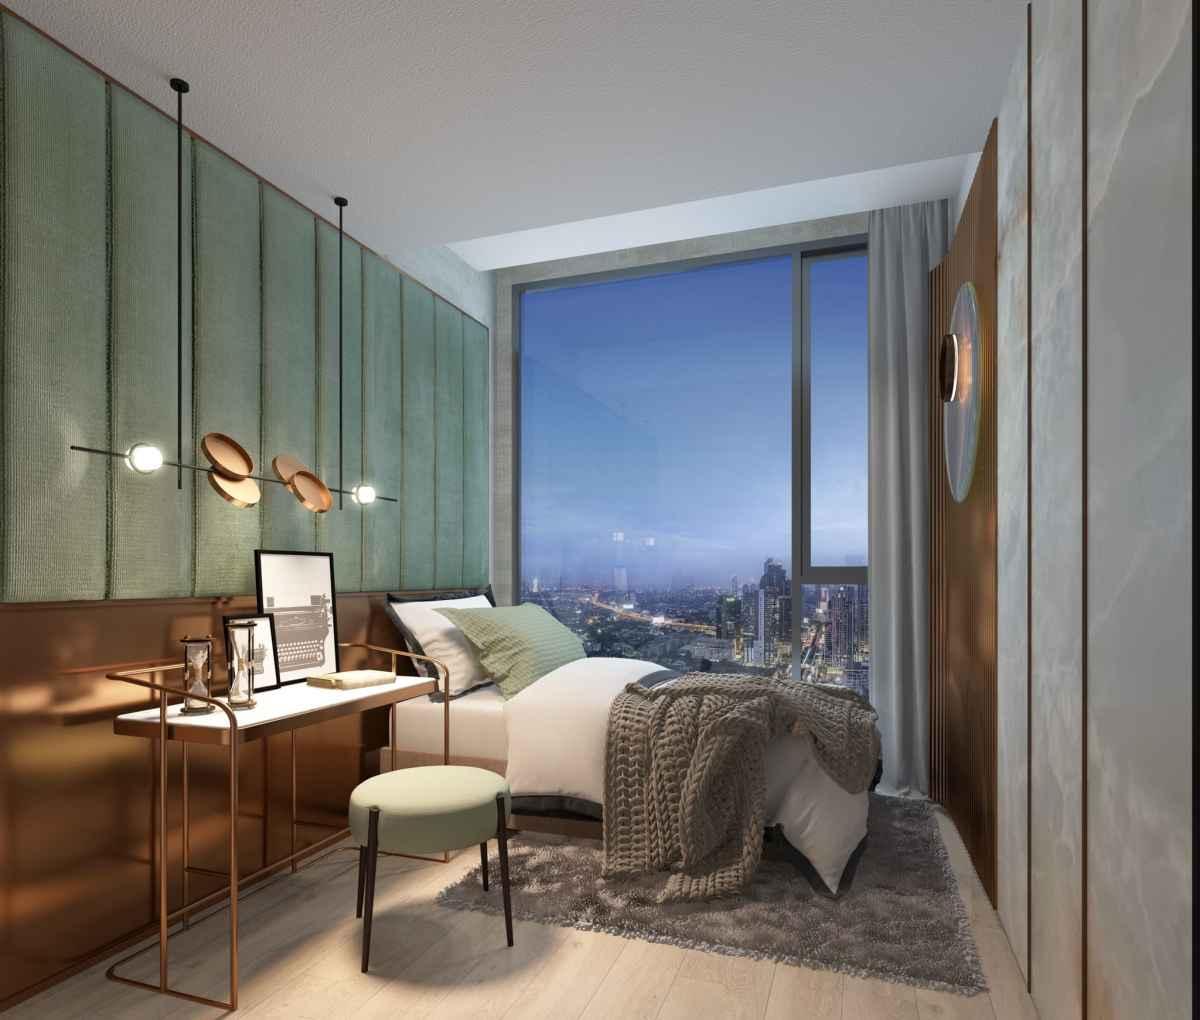 ANIL Sathorn 12 คอนโดสาทรสุดหรูที่ยกระดับคุณภาพชีวิตของผู้พักอาศัย ด้วยมาตรฐาน WELL Building Standard 113 - GRAND UNITY